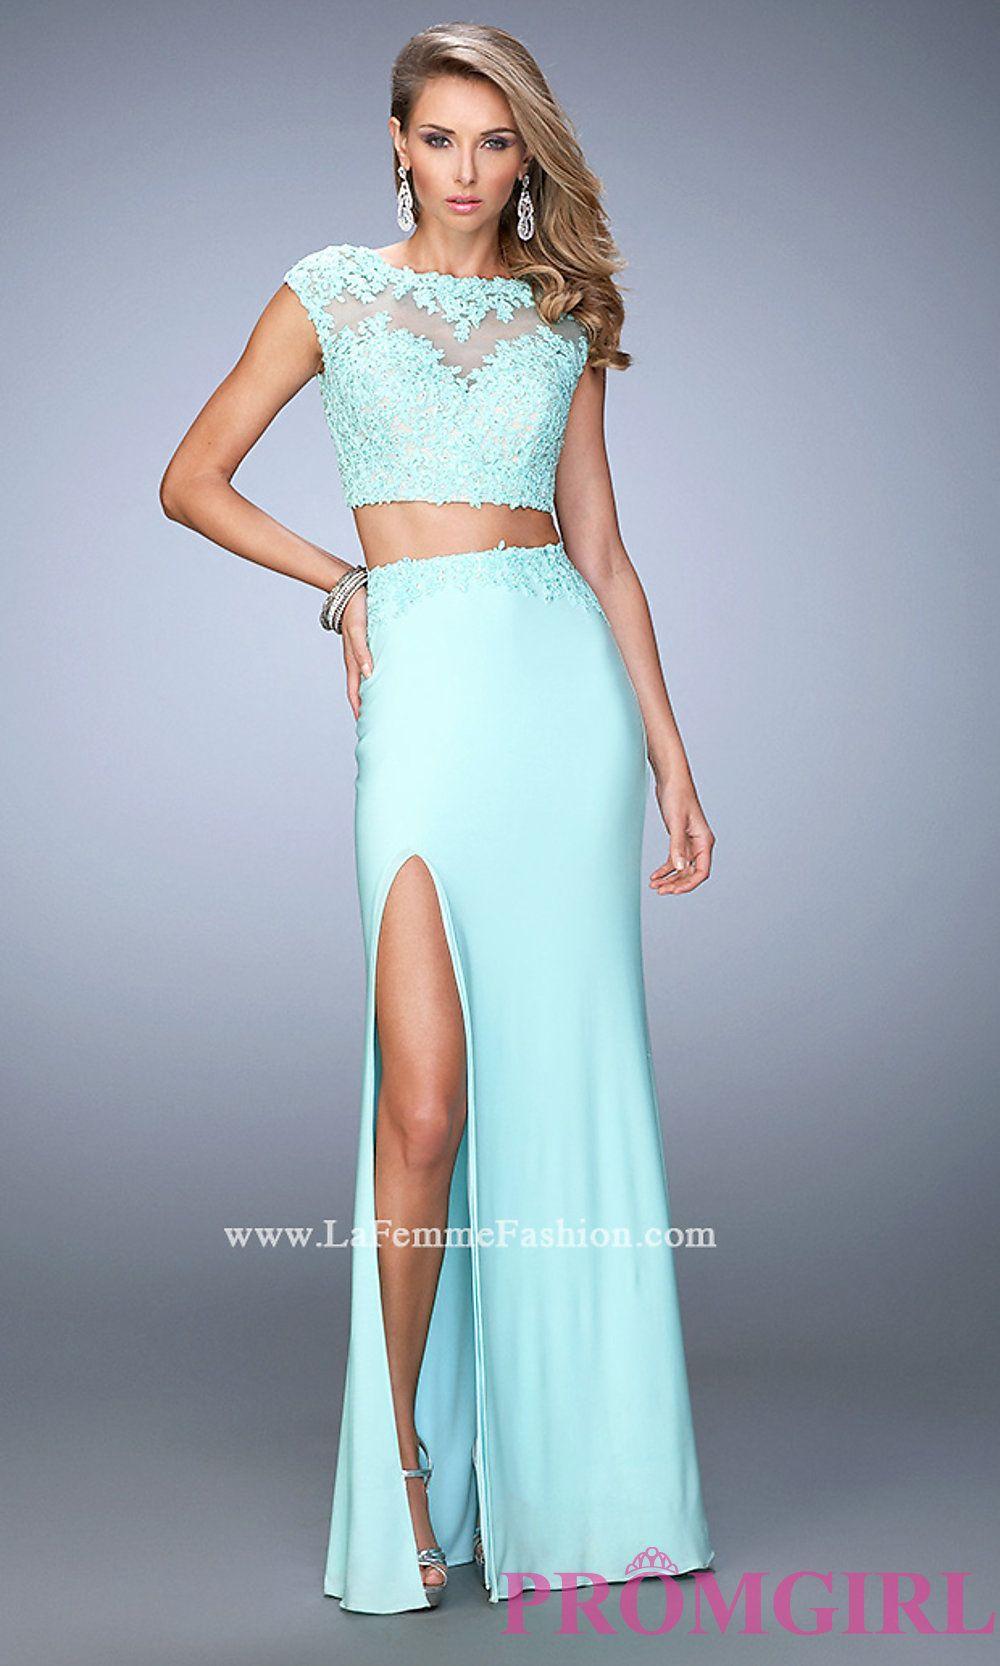 Two Piece Open Back Prom Dress by La Femme Style: LF-21867 | Prom ...